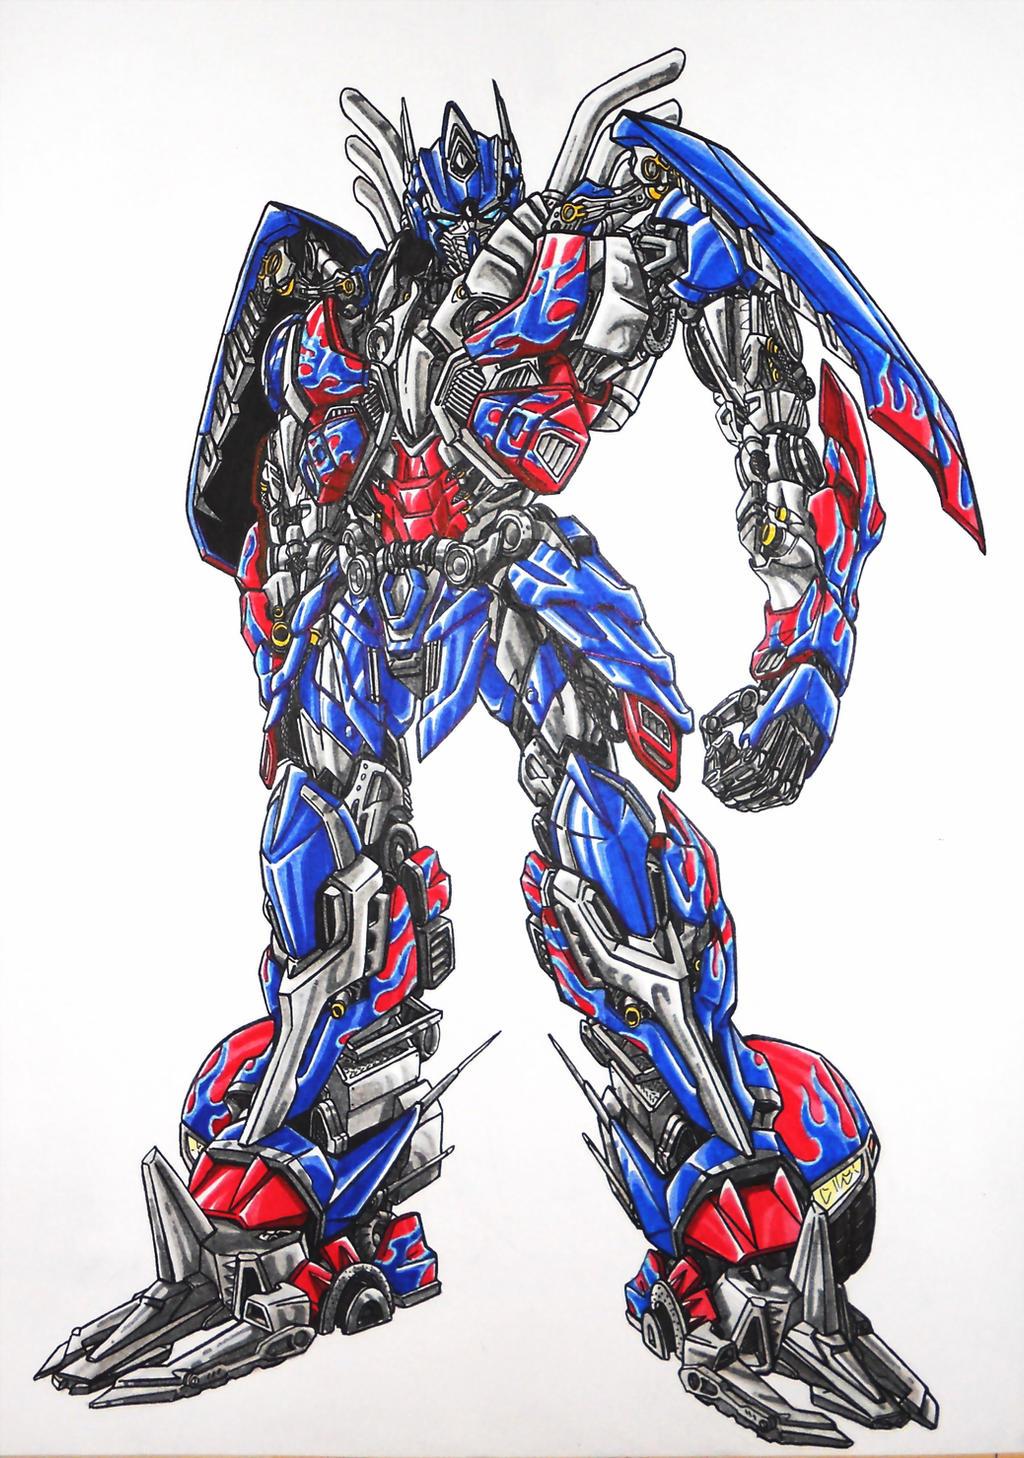 Transformers Age Of Extinction Optimus Prime Concept Art Transformers    Transformers Age Of Extinction Optimus Prime Fan Art